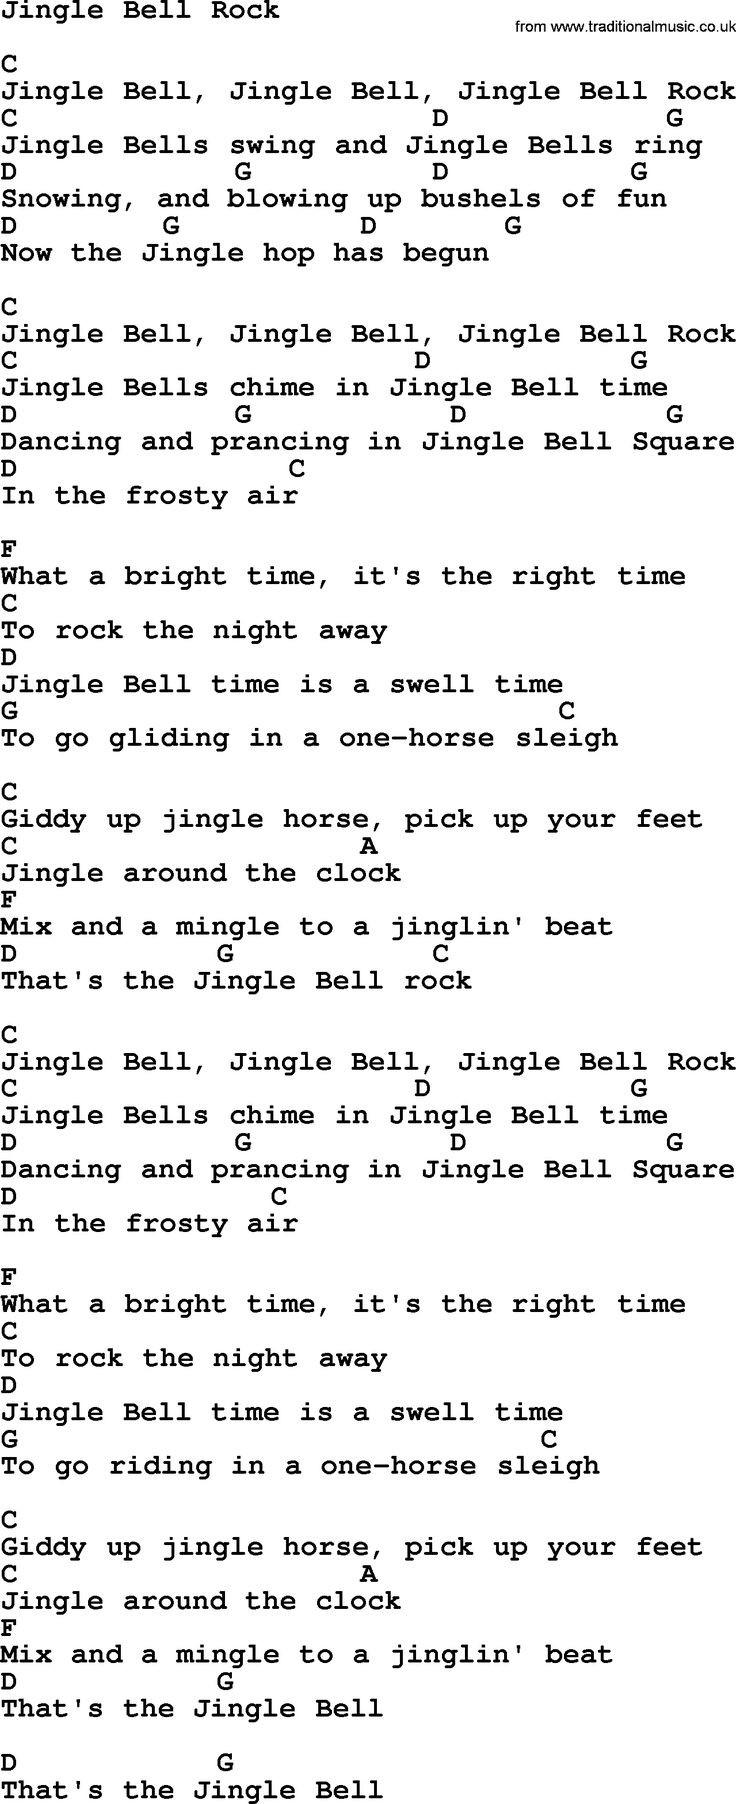 George Strait Christmas Cookies Lyrics  George Strait song Jingle Bell Rock lyrics and chords